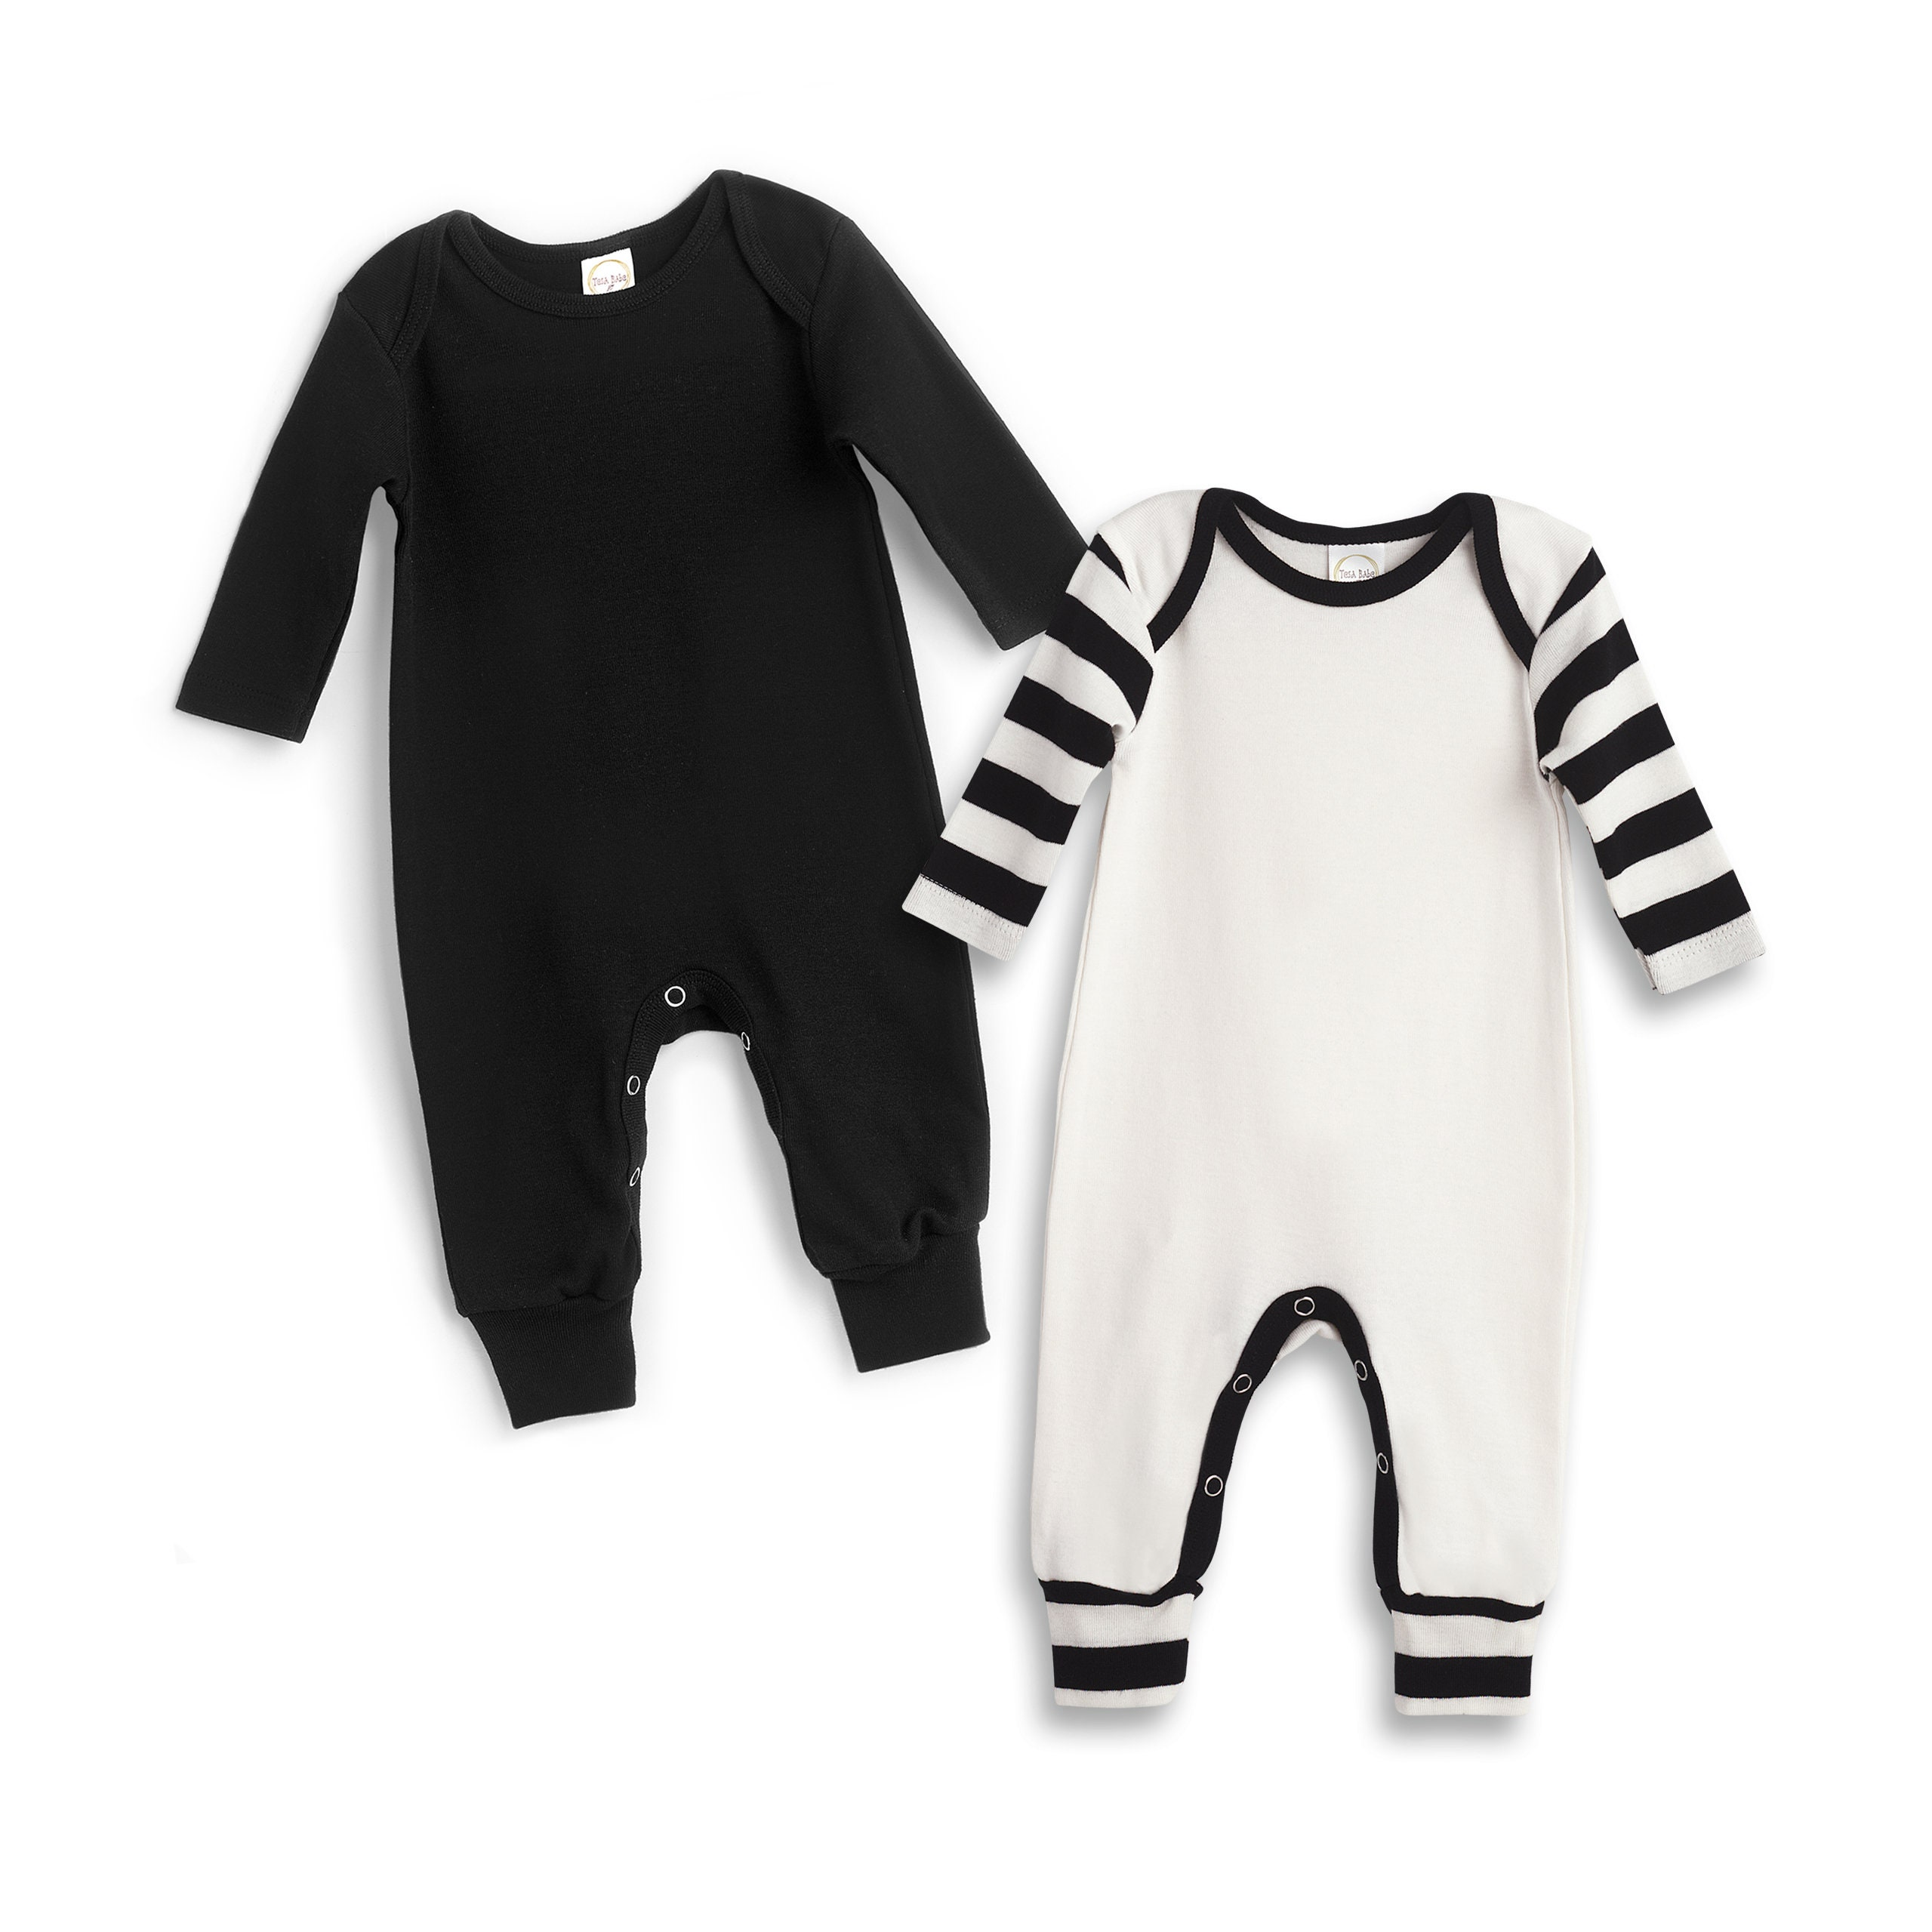 c056499d5e2 Newborn Baby Rompers Black White Set of 2